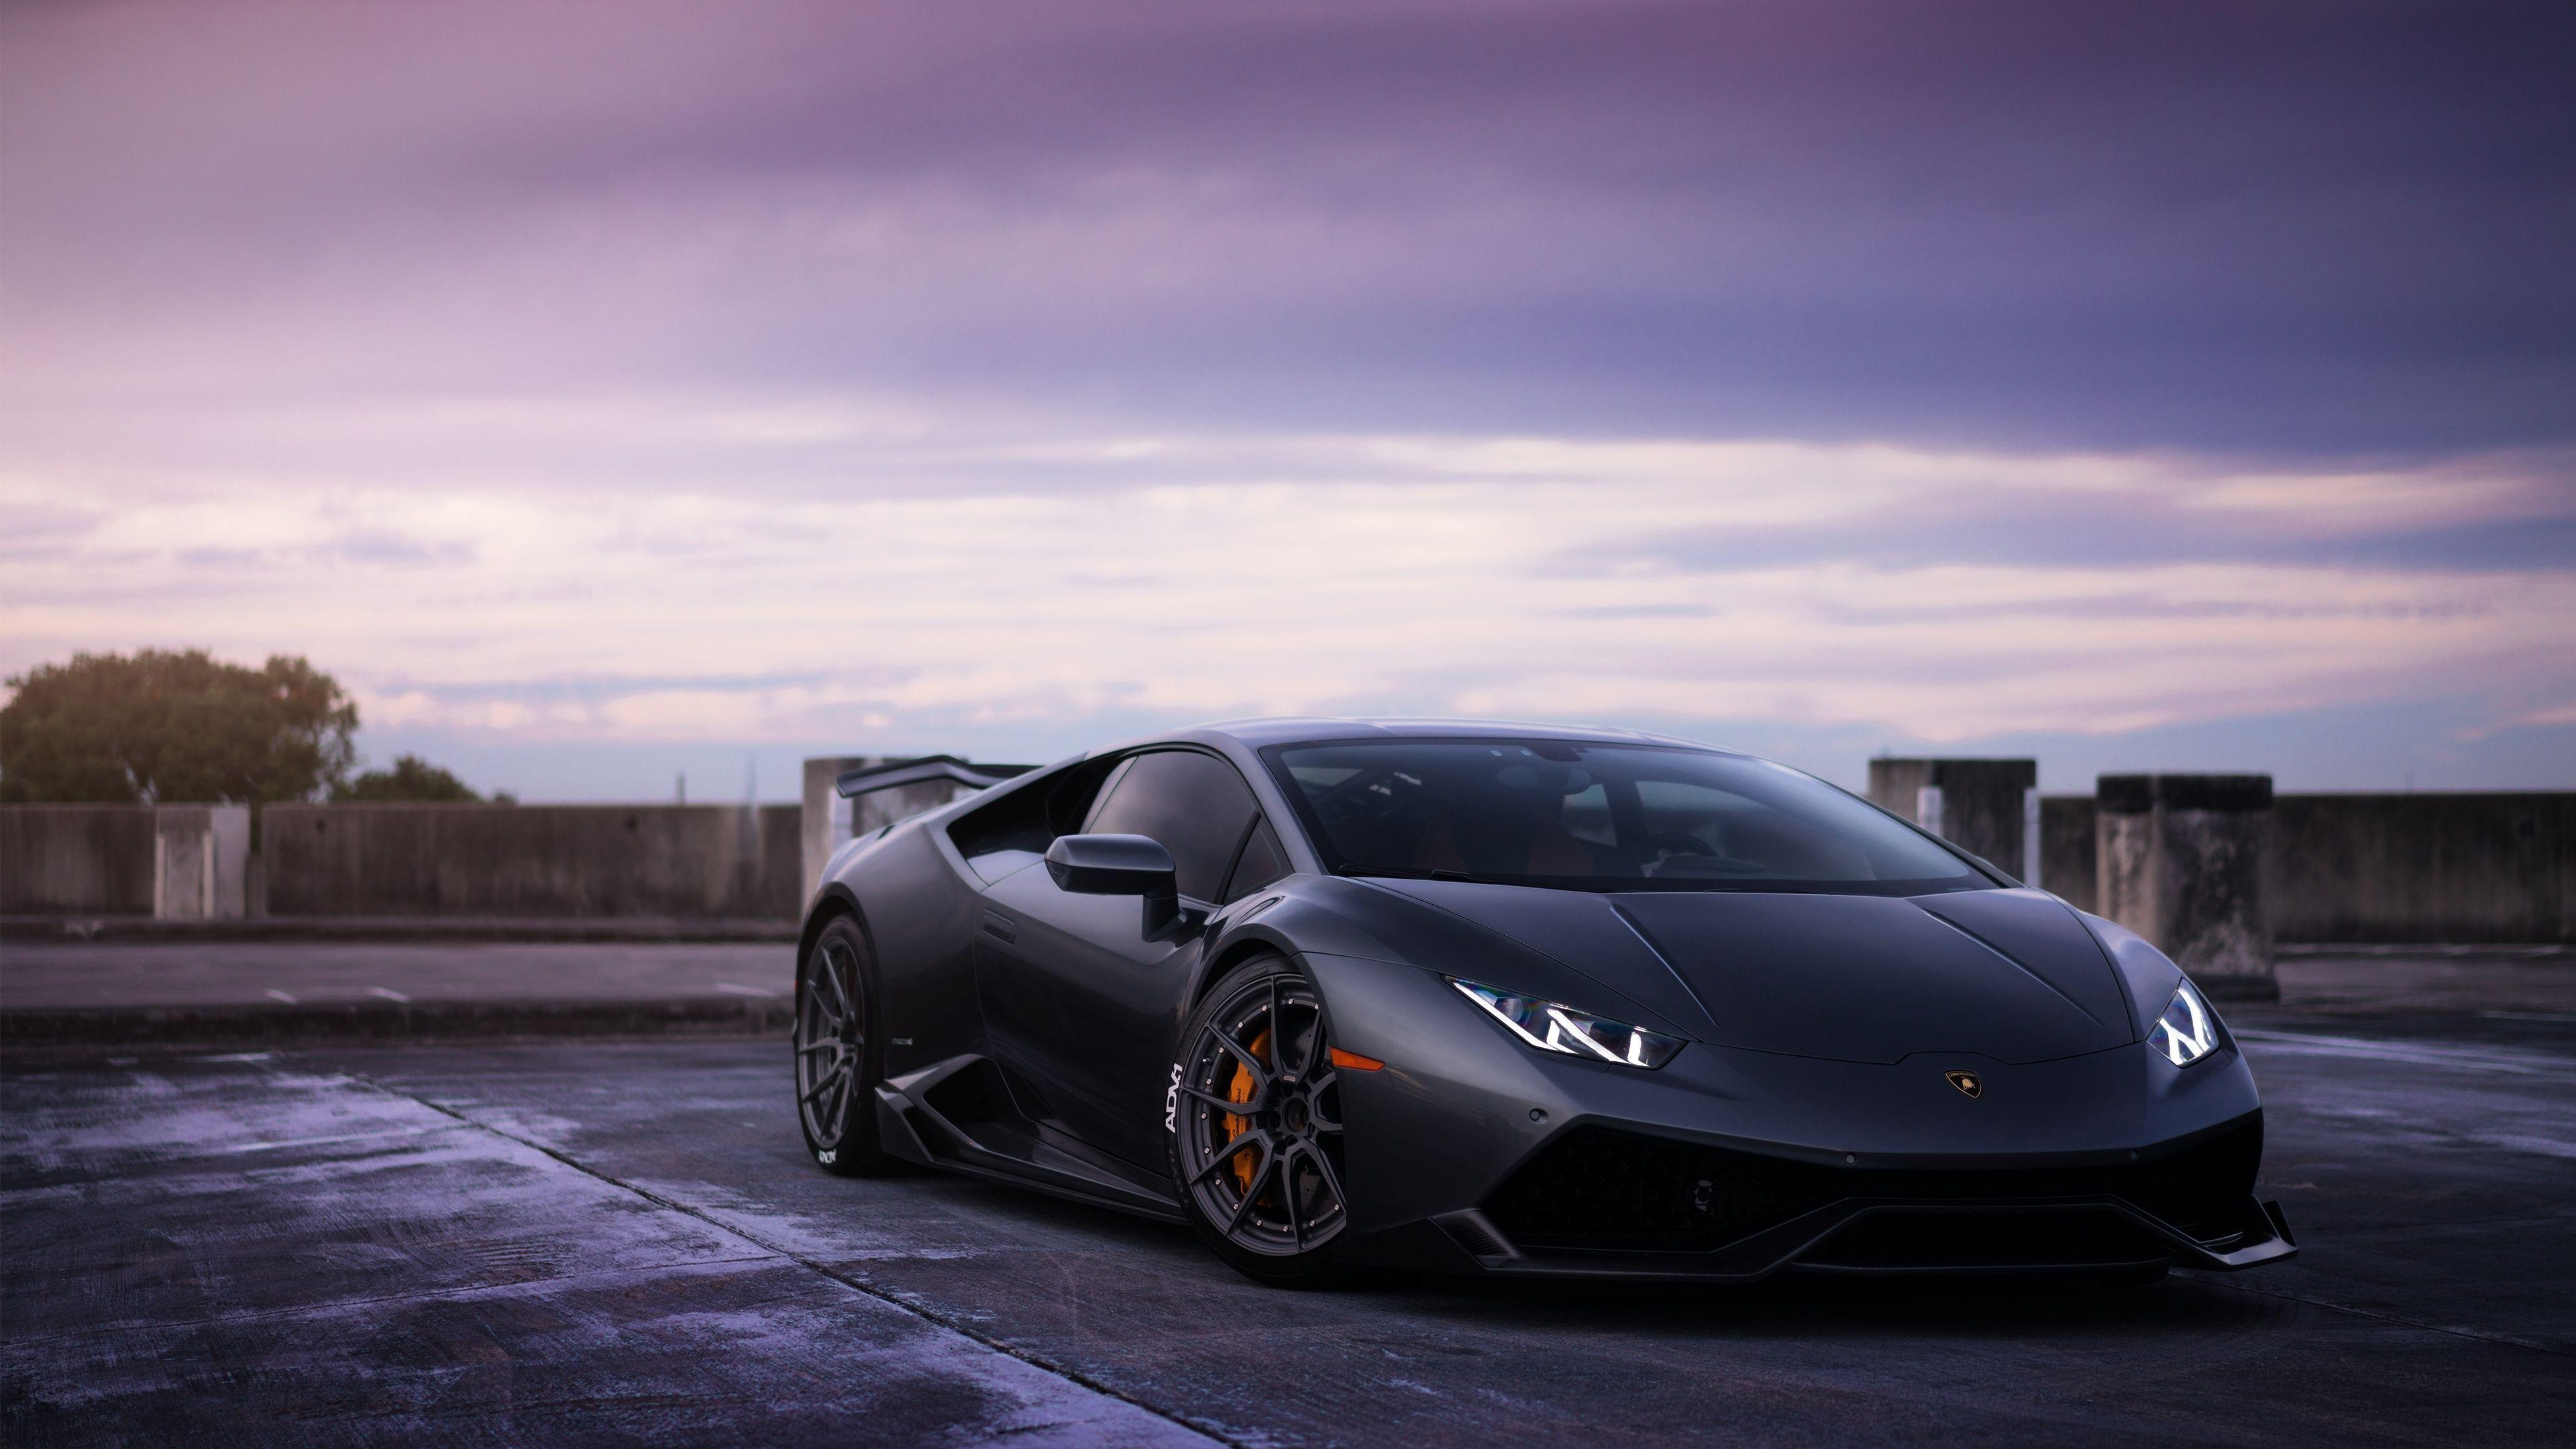 Lamborghini Huracan On Adv Wallpaper Hd Car Wallpapers